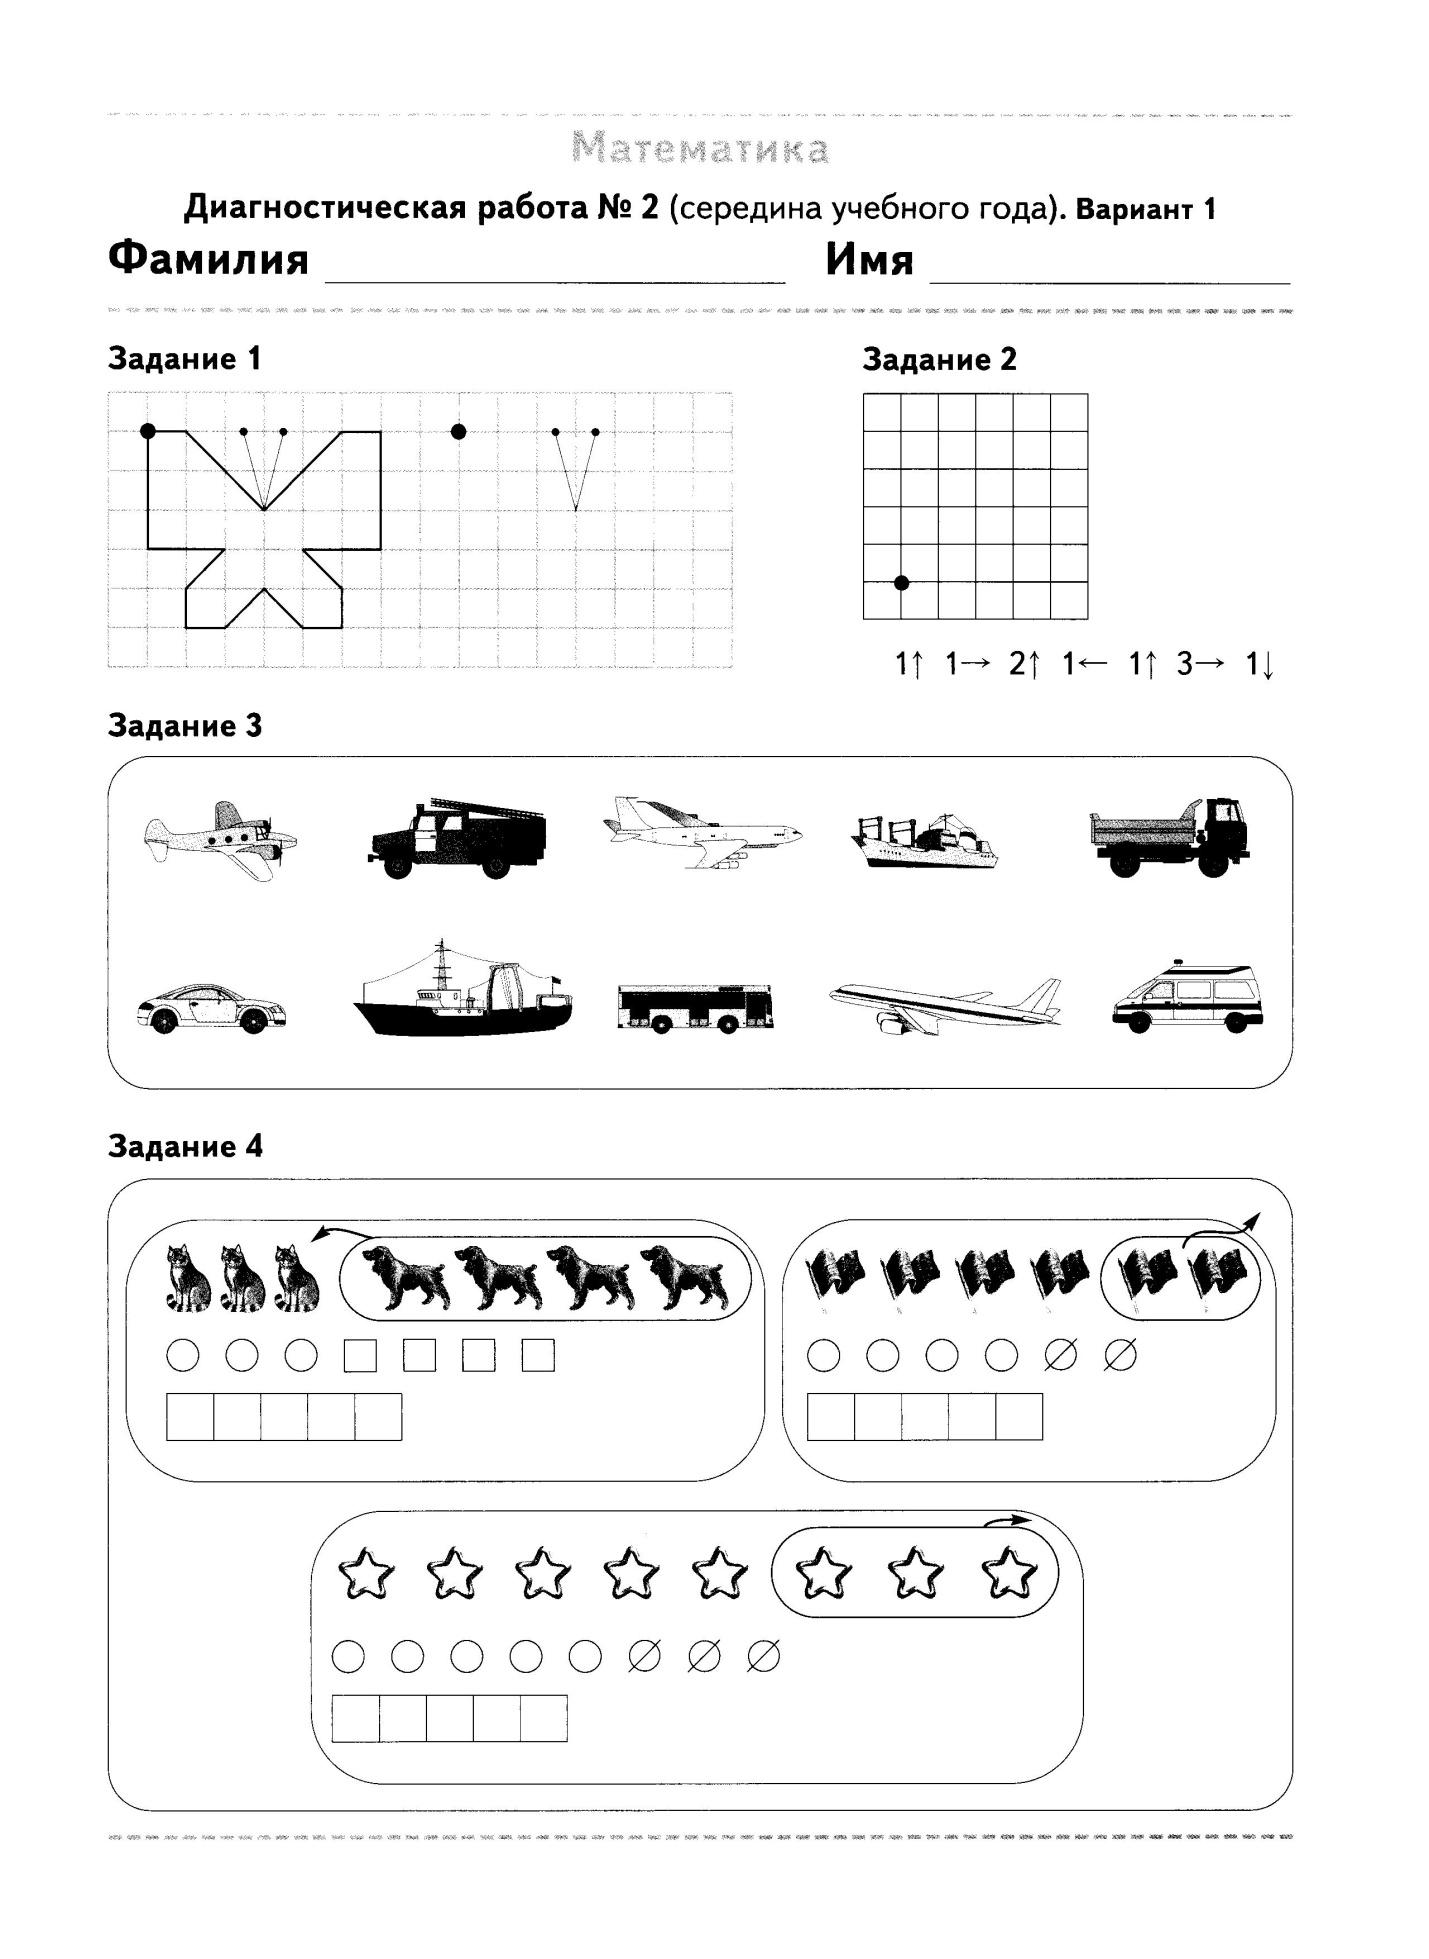 C:\Documents and Settings\User\Мои документы\Мои рисунки\2014-12-15\Диагностическая работа по математике, 2 класс, Виноградова Н. 004.jpg